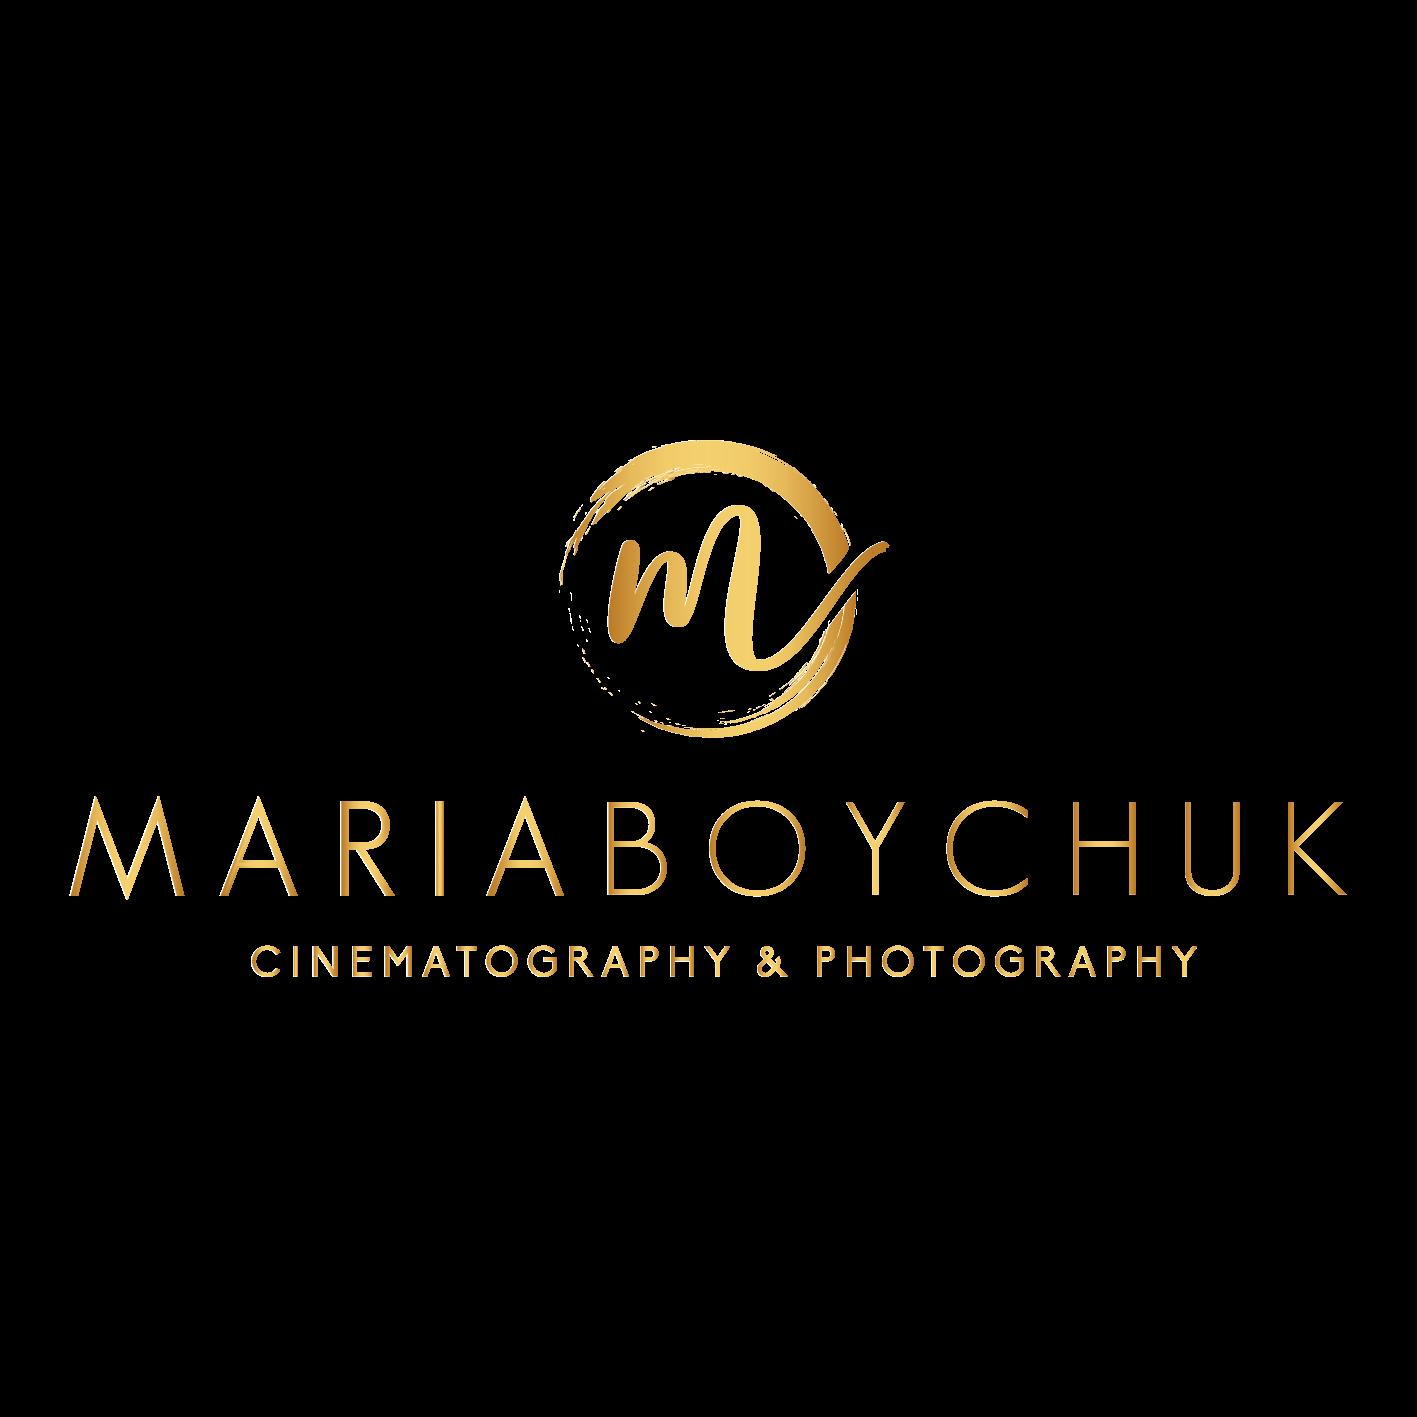 mariaboytchuk-gold-transparent.png